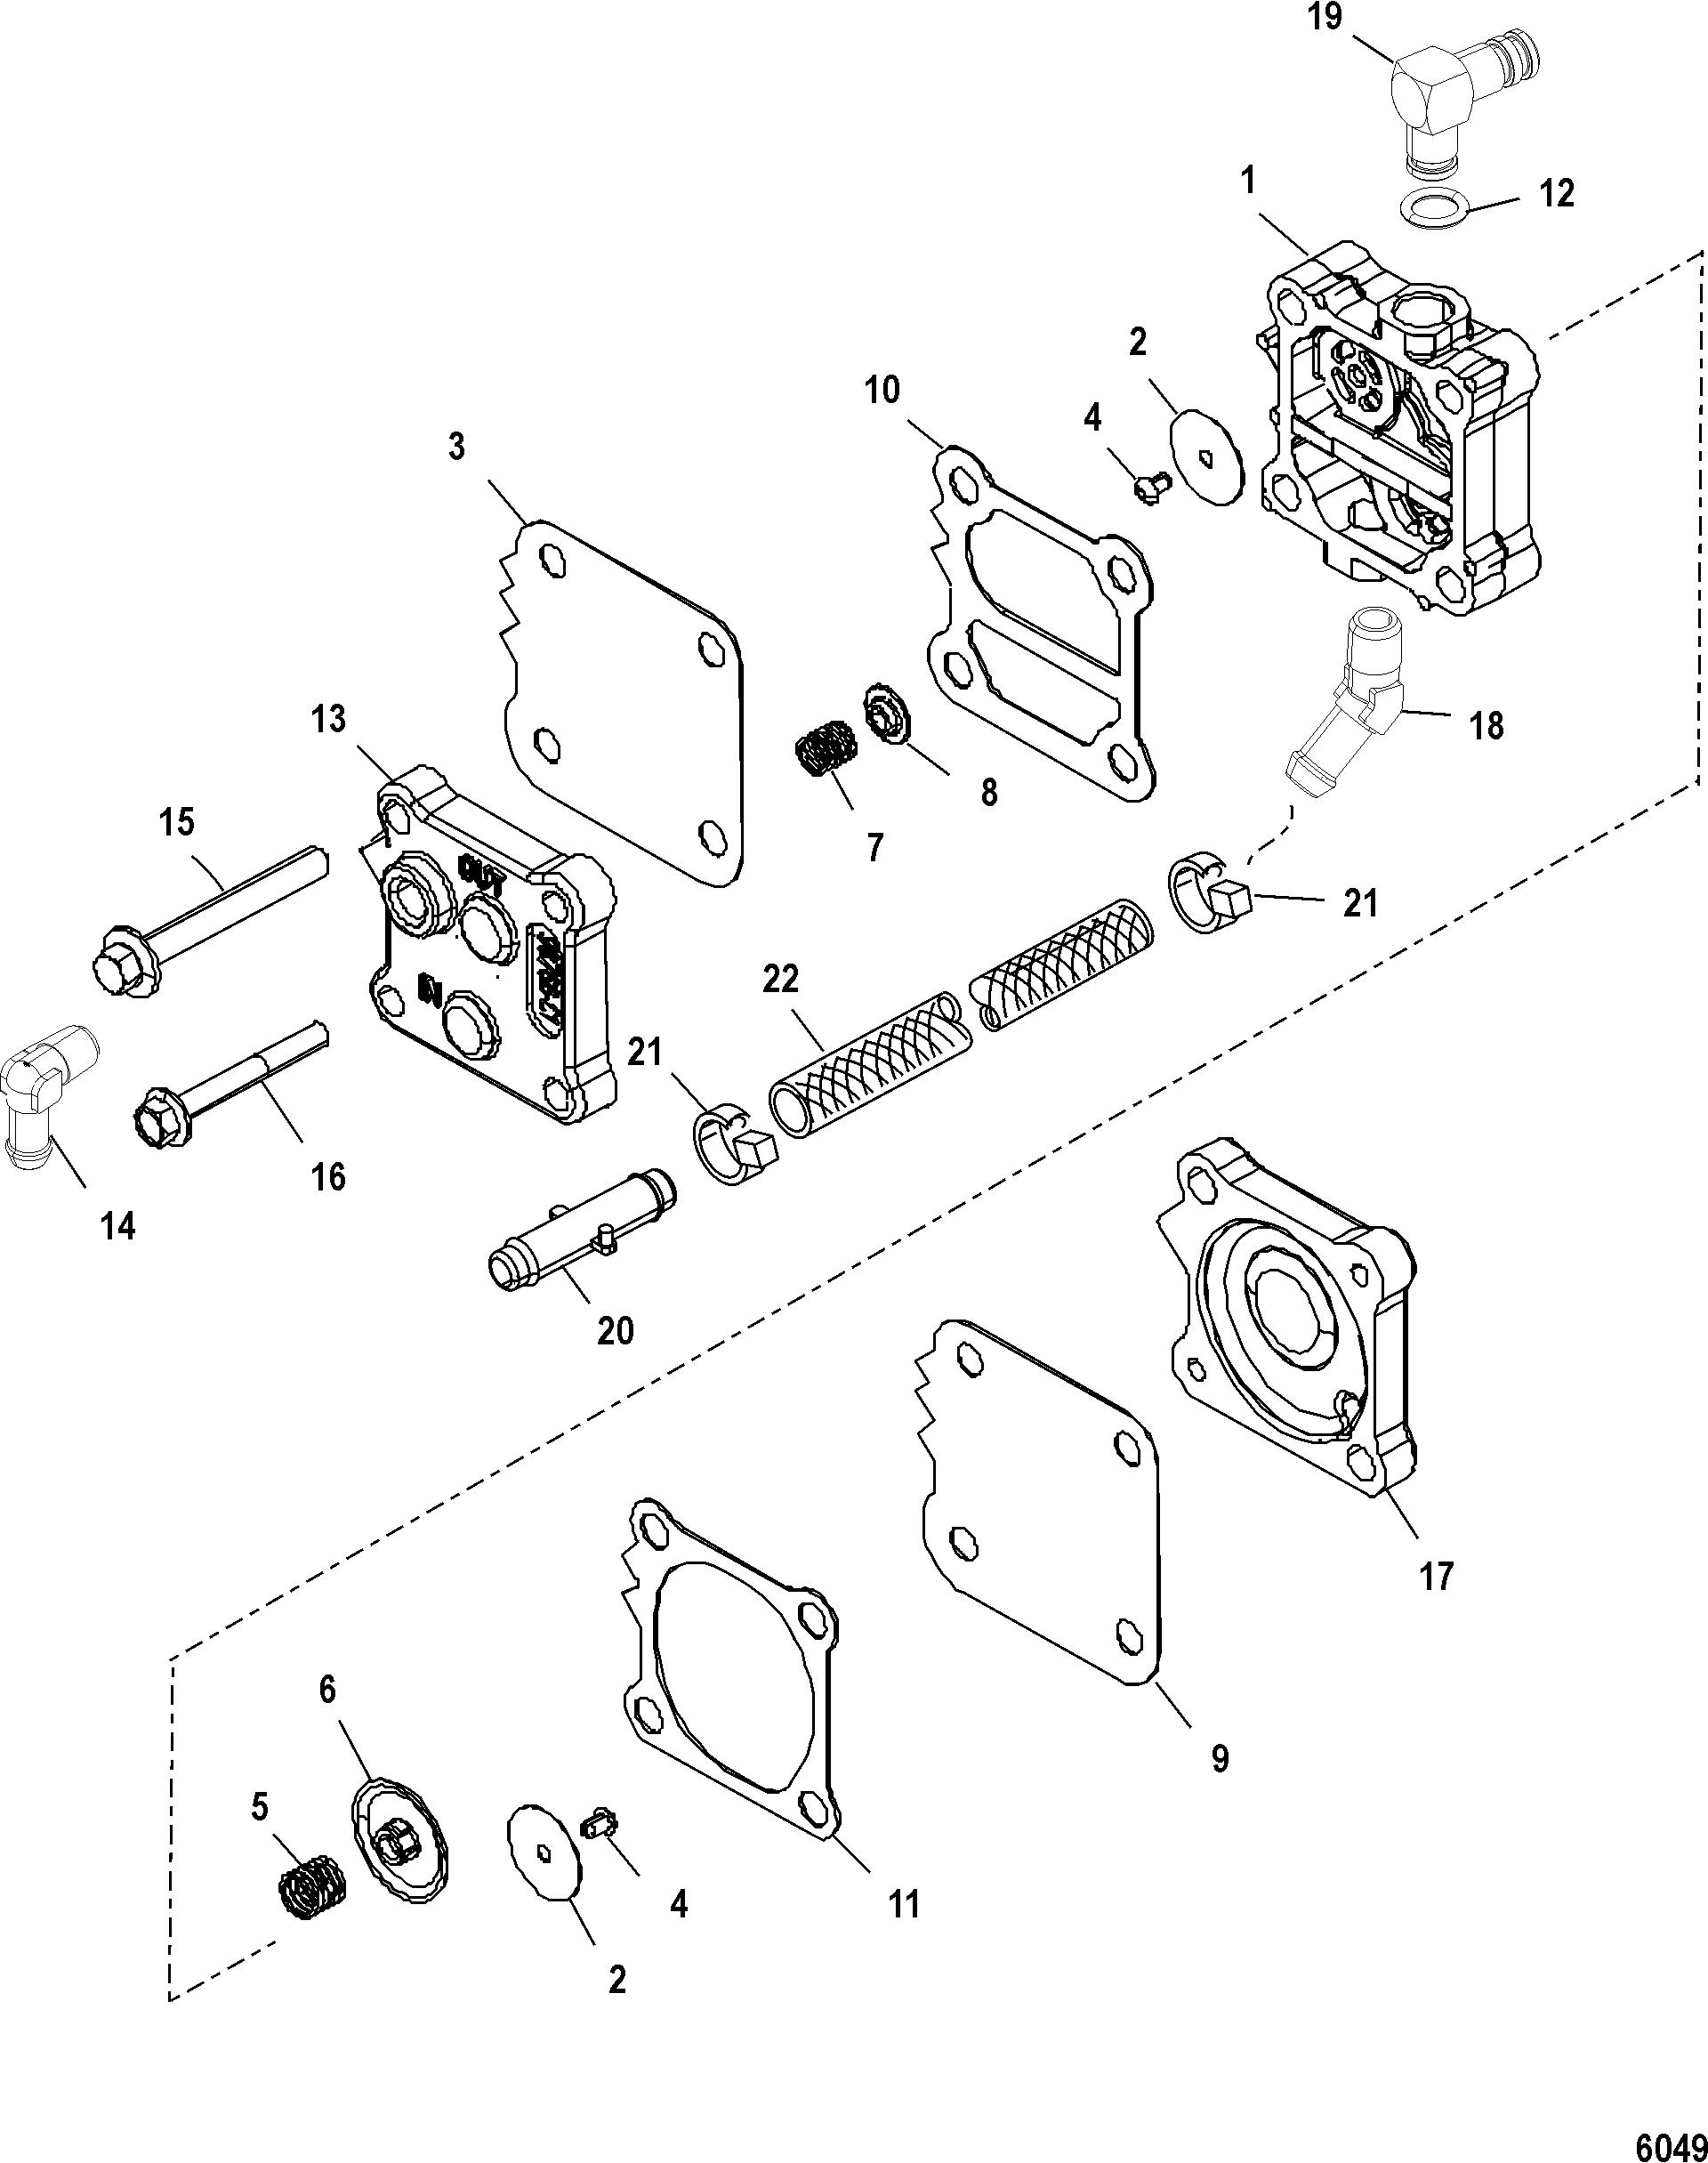 fuel pump for mercury 250 pro xs 3 0l